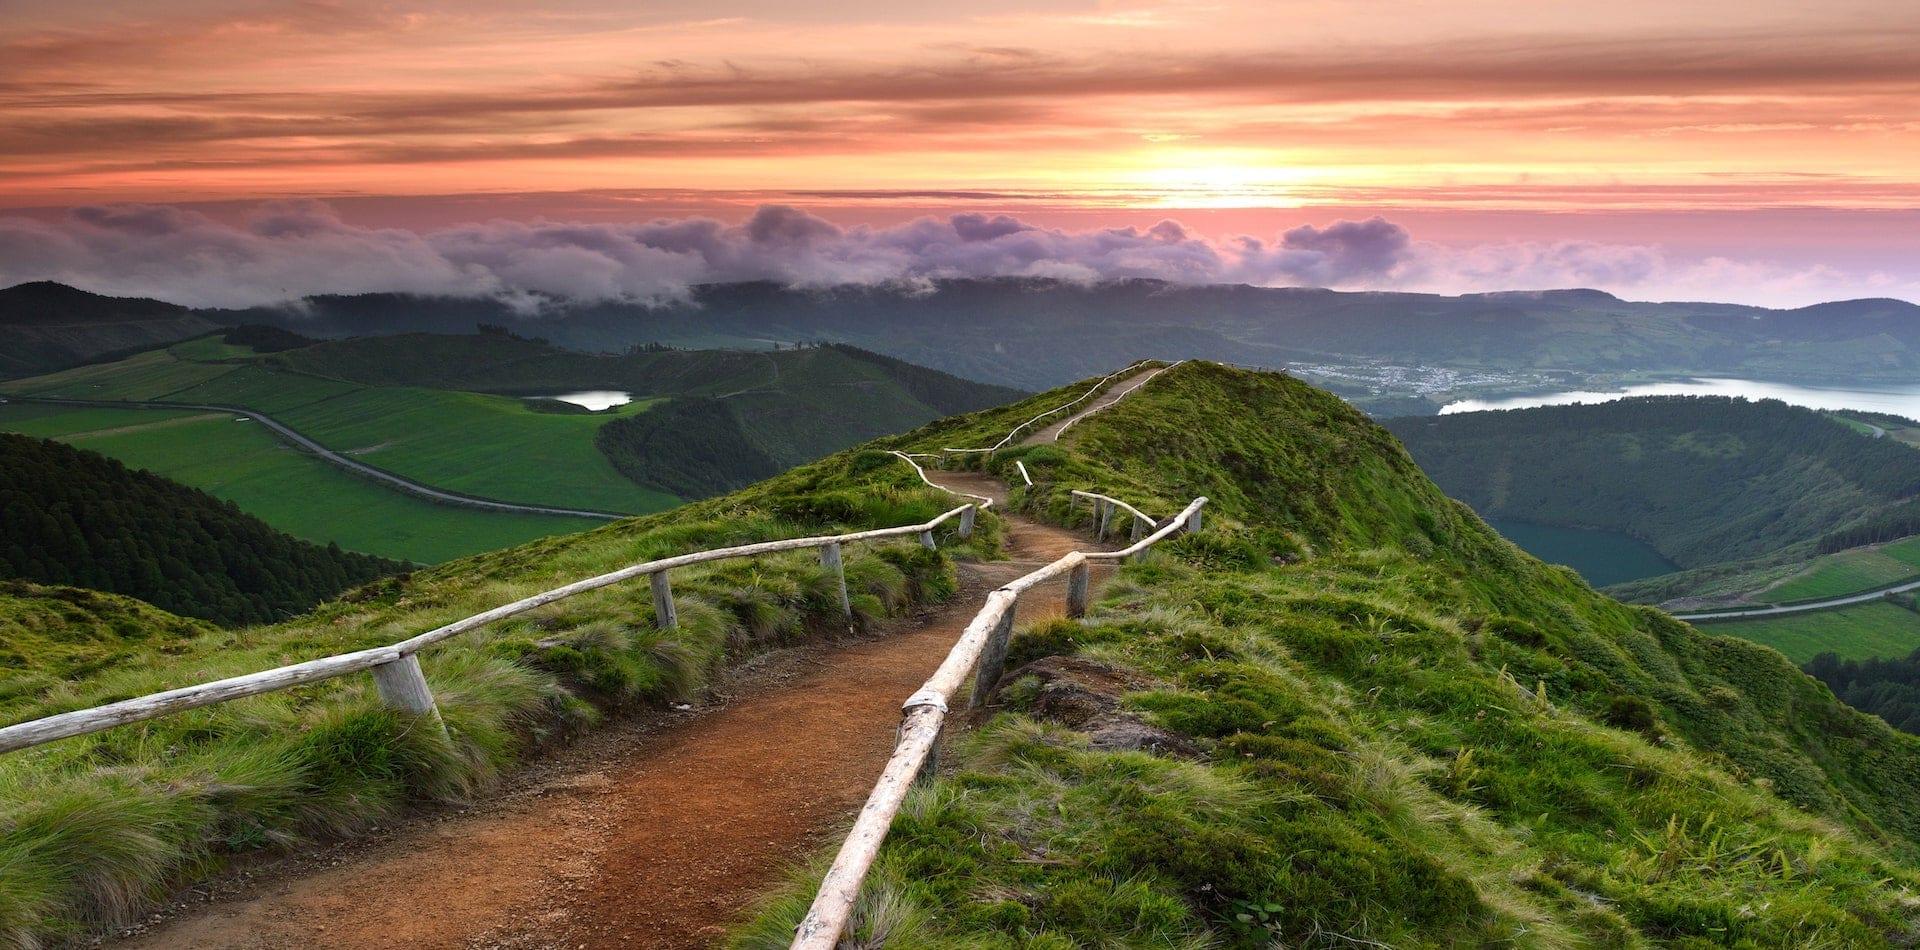 Hiking path along a ridge to the sunset